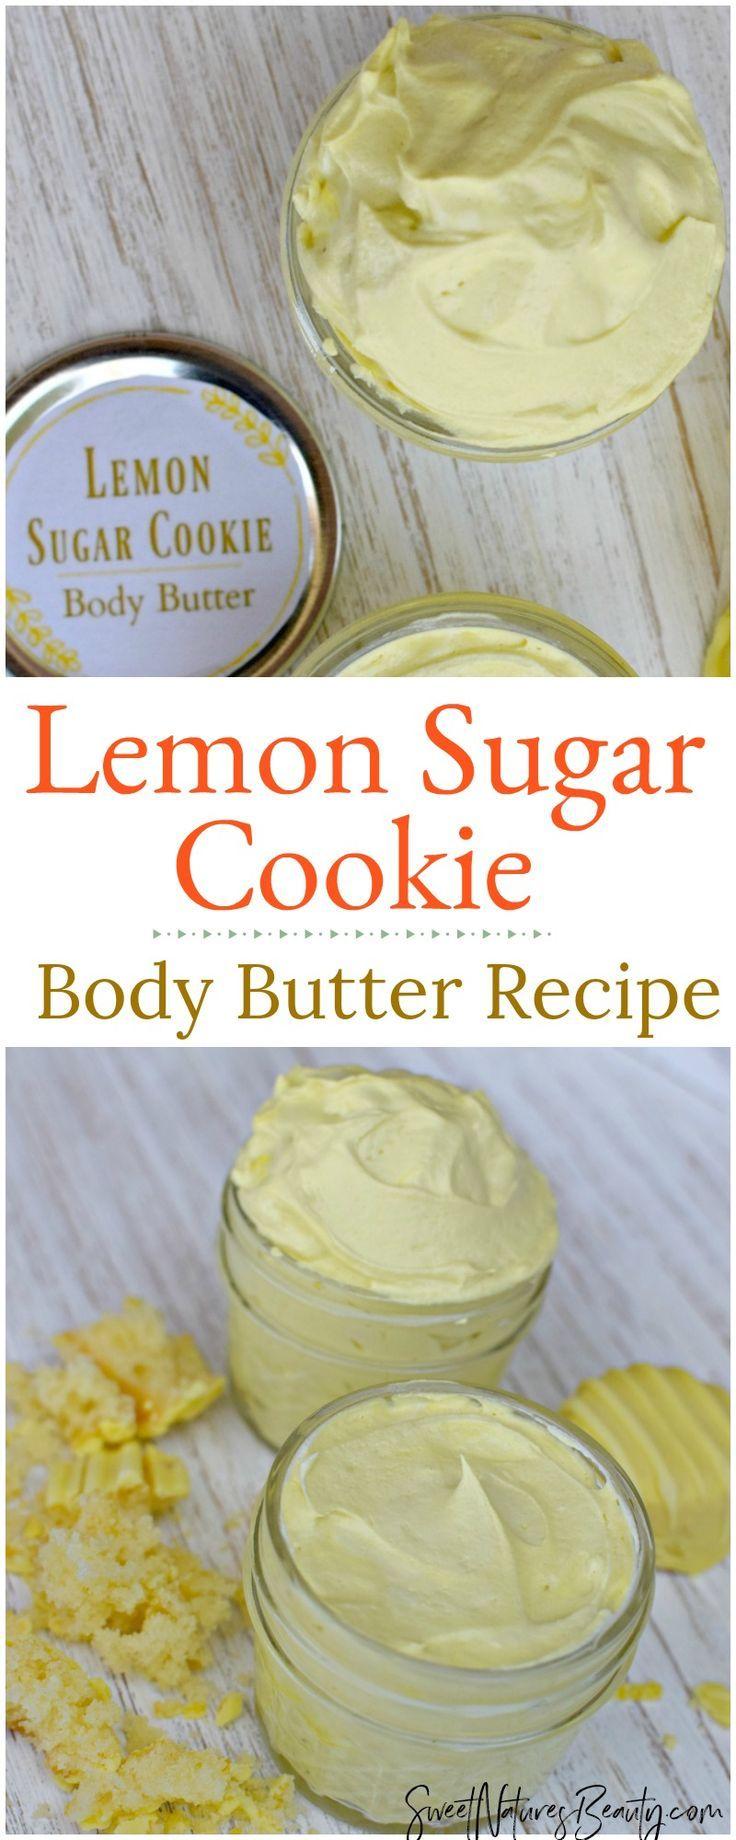 Lemon Sugar Cookie Whipped Body Butter Recipe Lemon Sugar